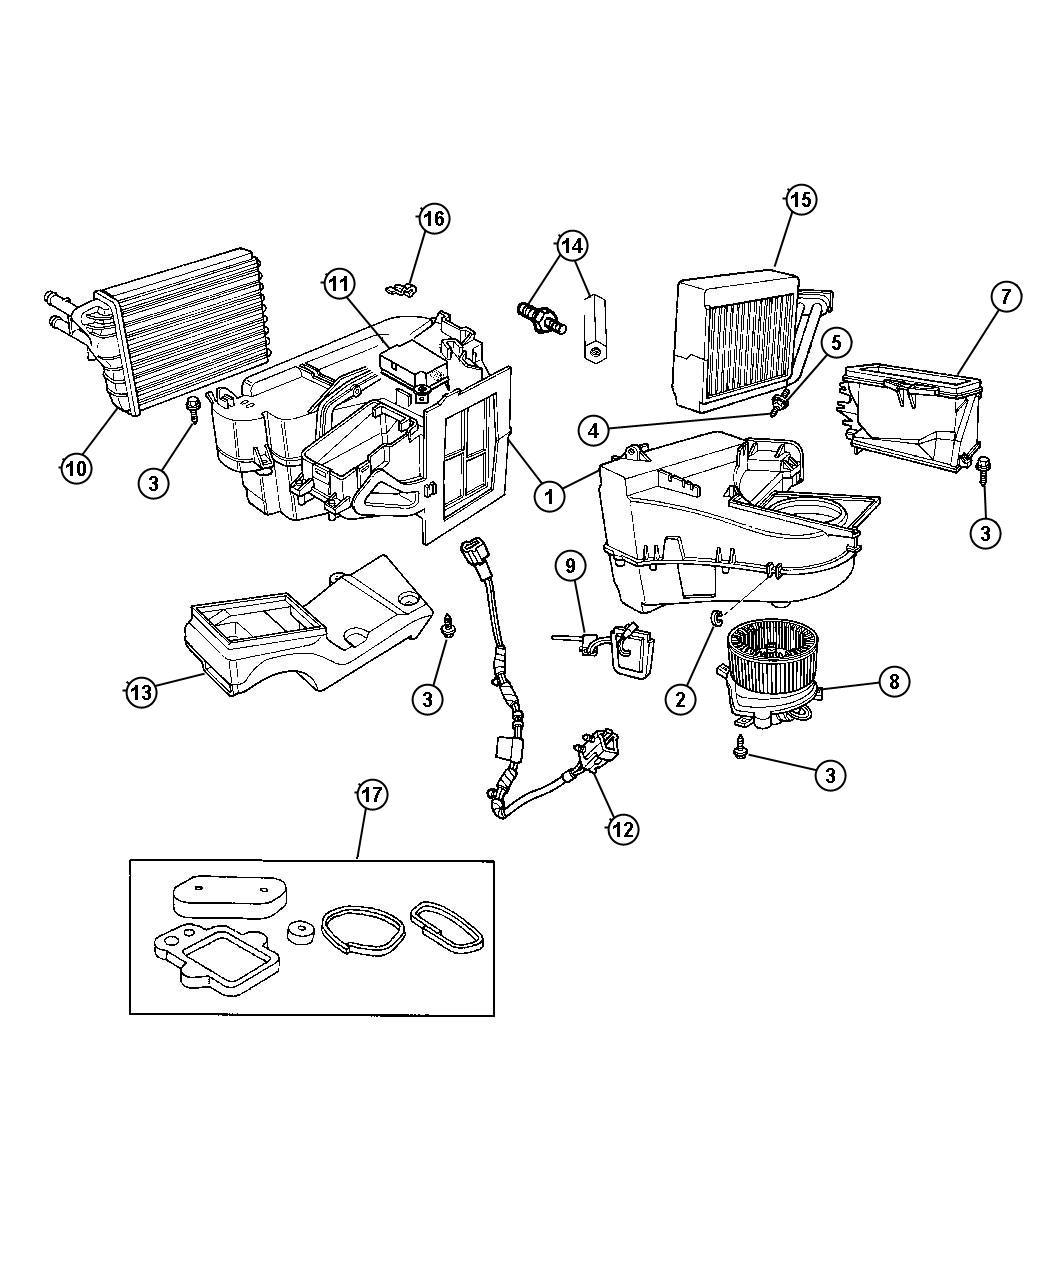 Central Ac Parts